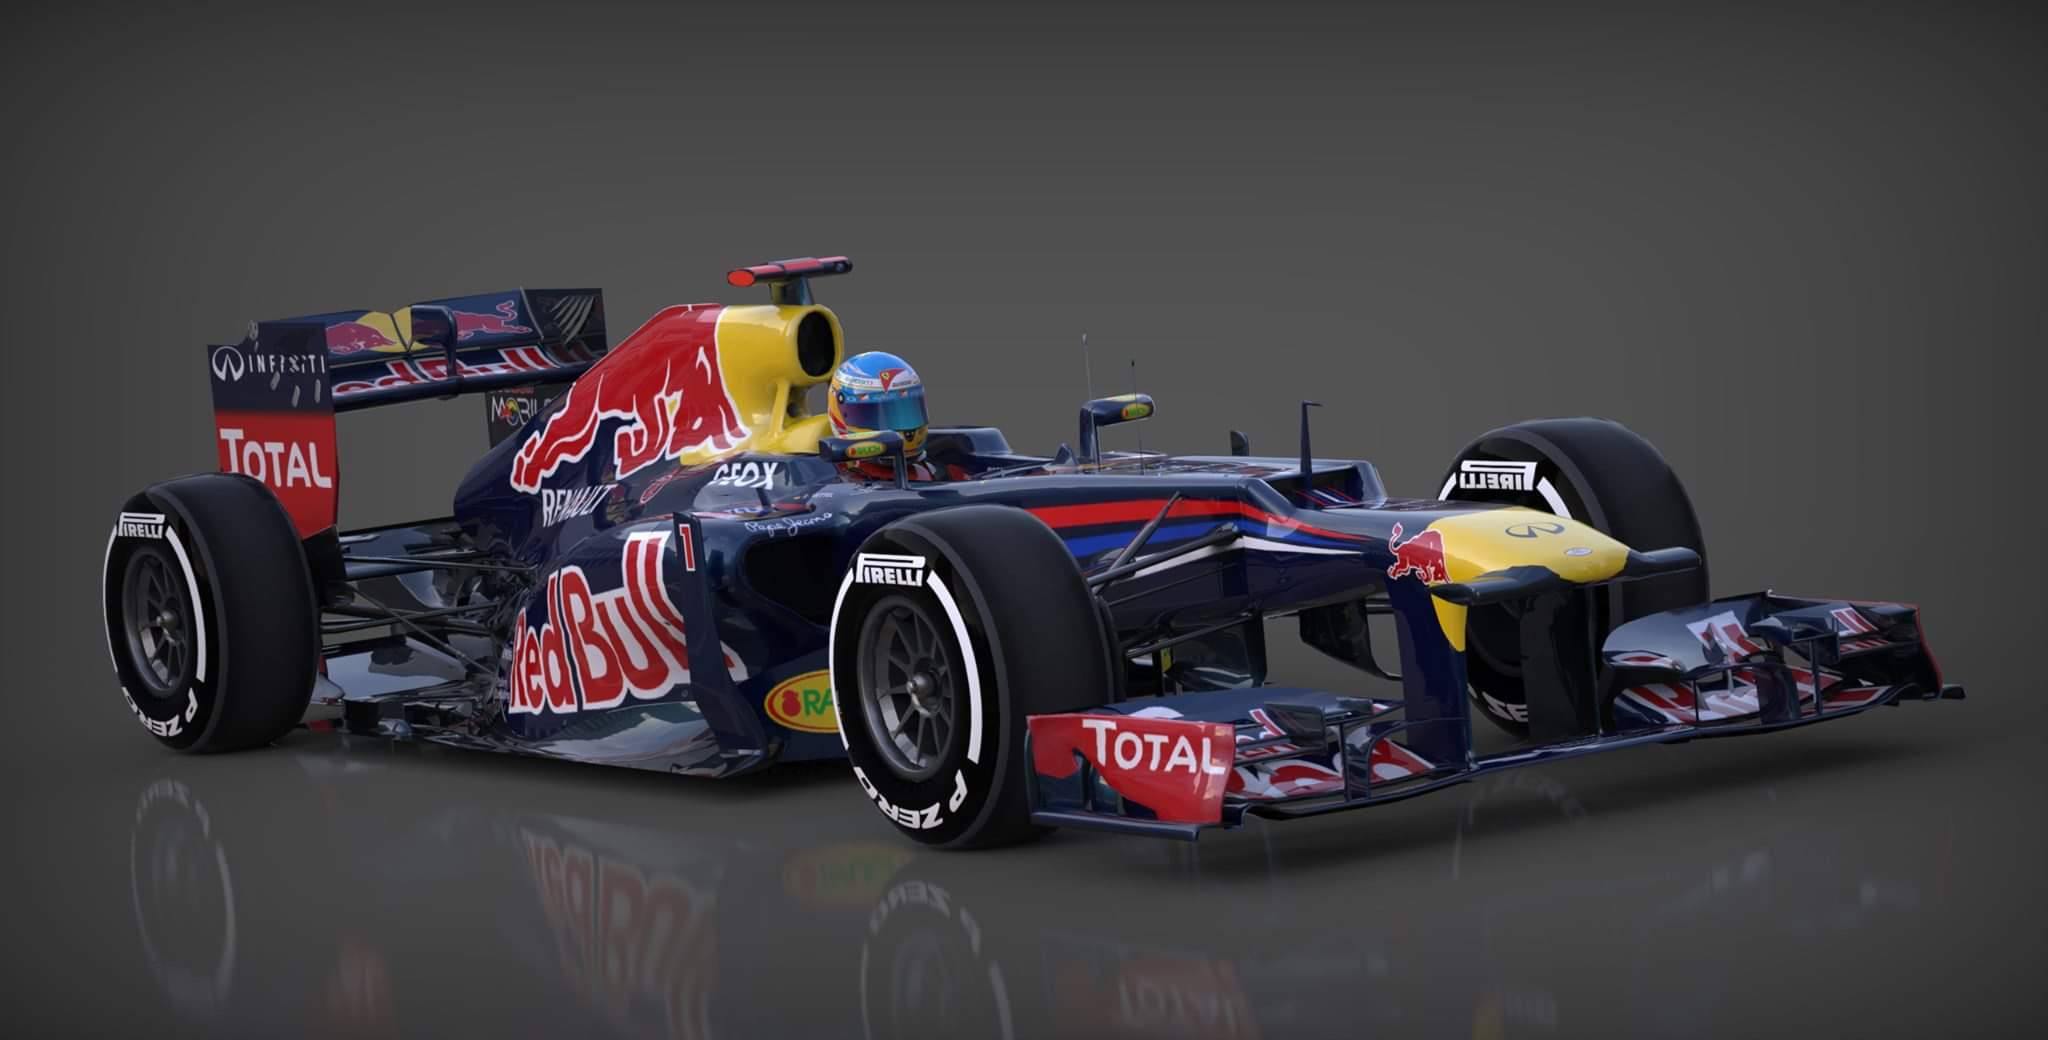 Download Formula F1 Racing Car Mod for Bus Simulator Indonesia, , Bus Mod, BUSSID mod, Car Mod, Formula F1 Racing Car, Mod for BUSSID, SGCArena, Vehicle Mod, WSPMods